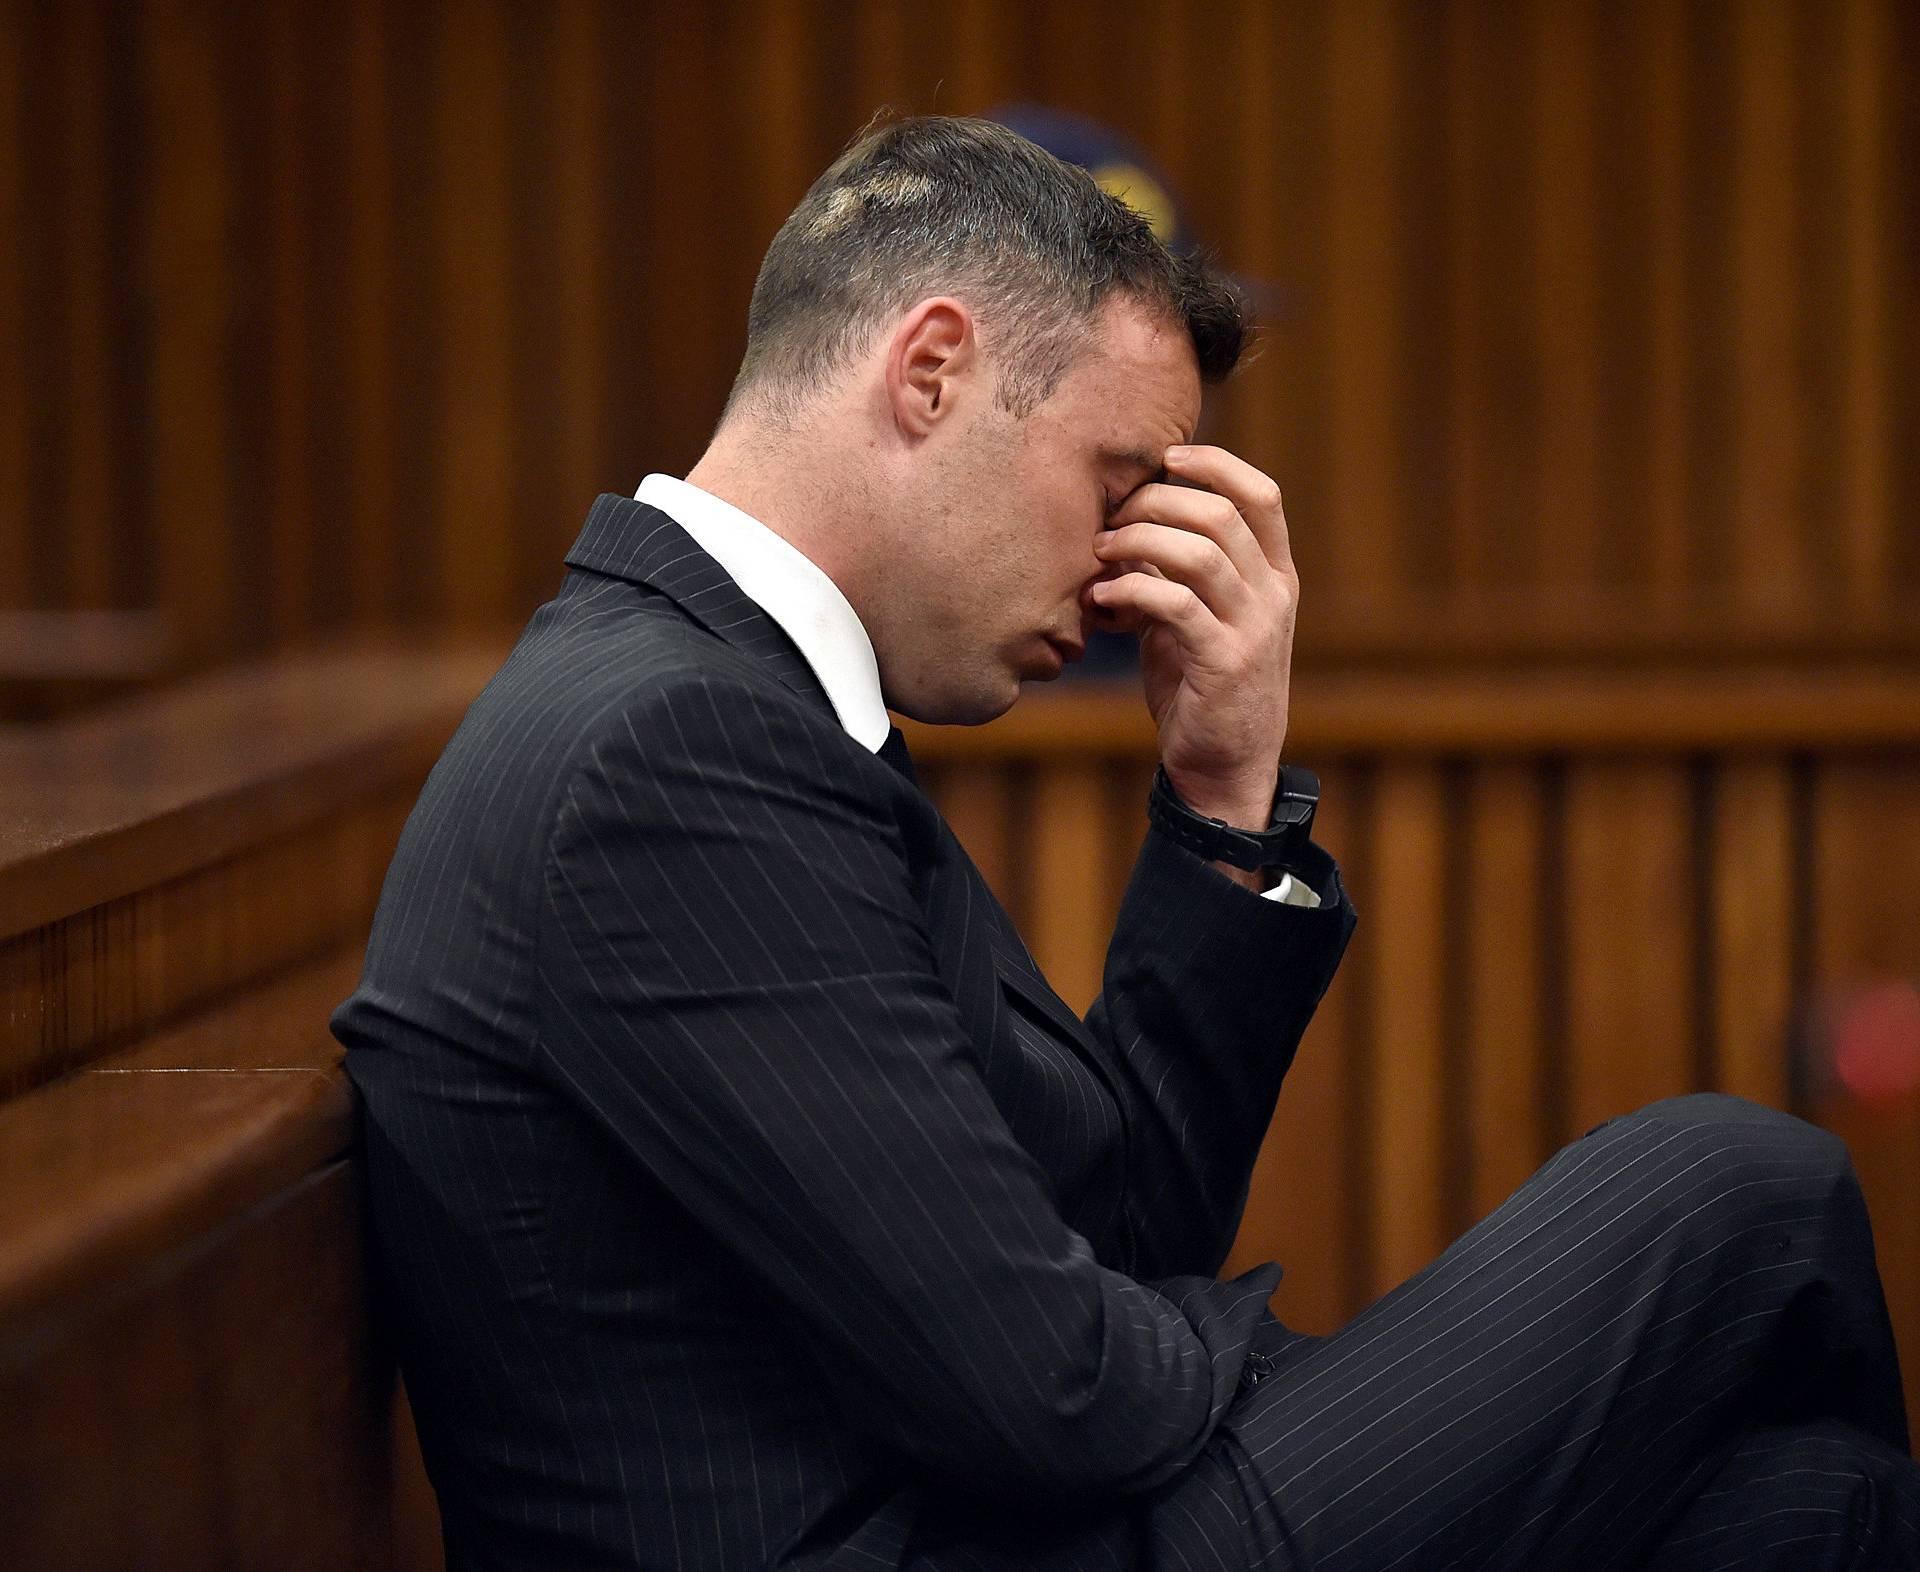 Former Paralympian Oscar Pistorius attends his sentencing for the murder of Reeva Steenkamp at the Pretoria High Court